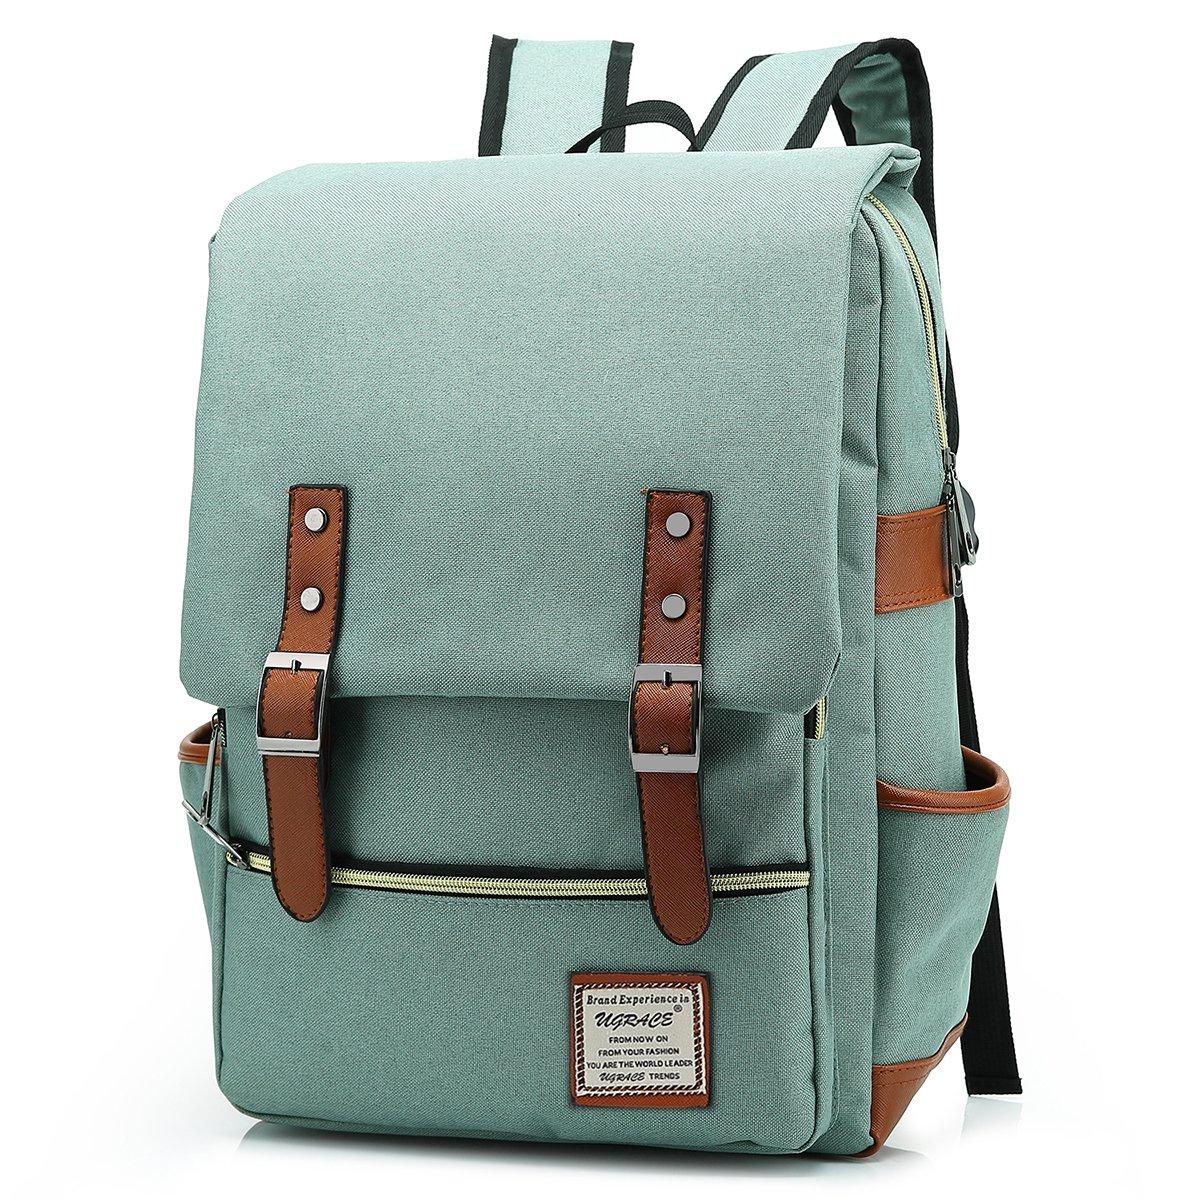 UGRACE Slim Business Laptop Backpack Elegant Casual Daypacks Outdoor Sports Rucksack School Shoulder Bag for Men Women, Tear Resistant Unique Travelling Backpack Fits up to 15.6Inch Macbook in Green by UGRACE (Image #1)